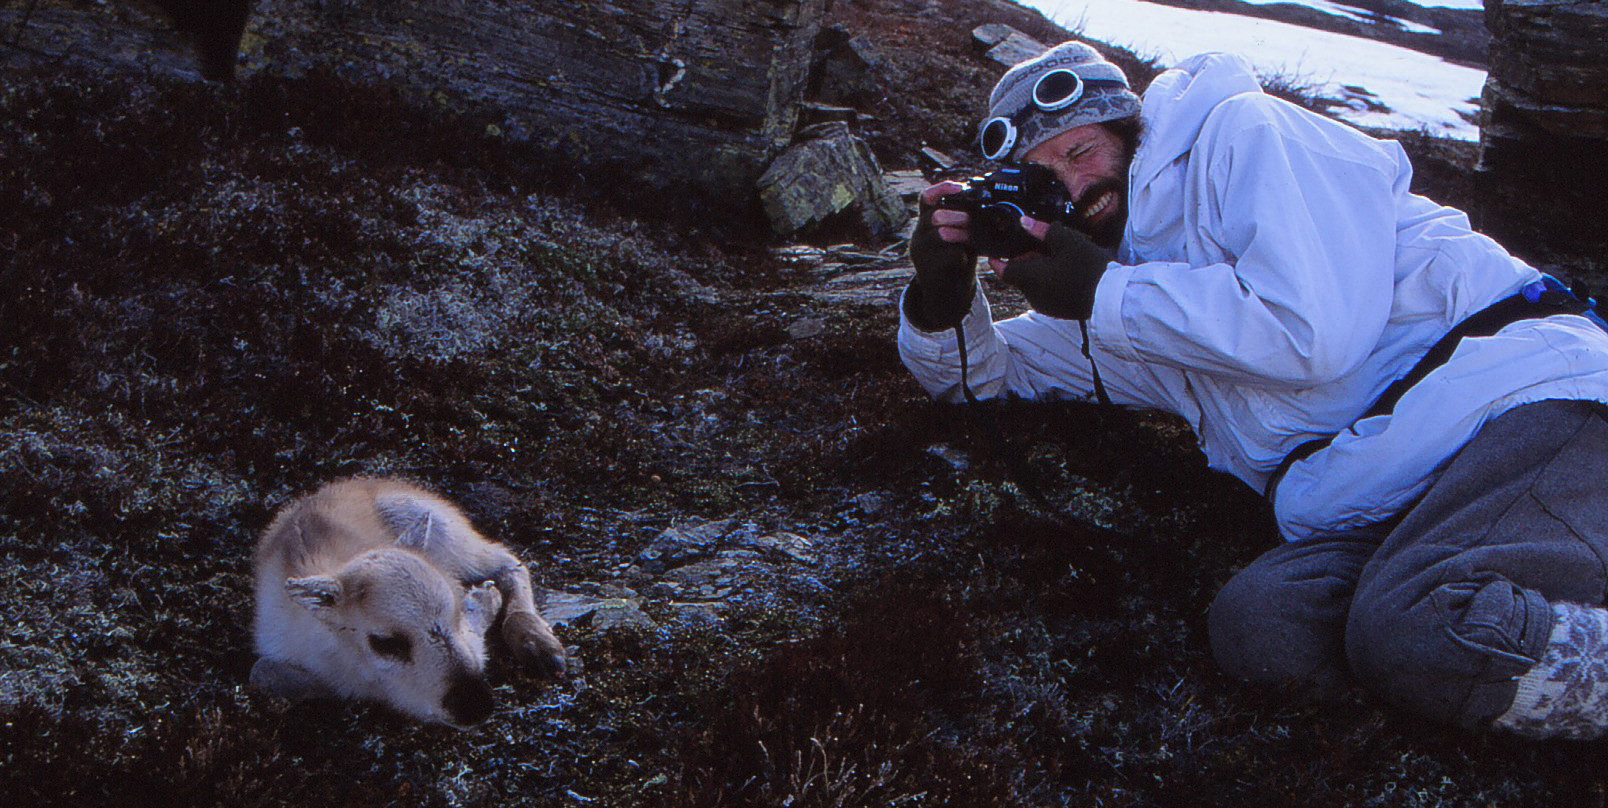 Terje Skogland fotograferer ein reinskalv under feltarbeid. Foto: Johan Brun